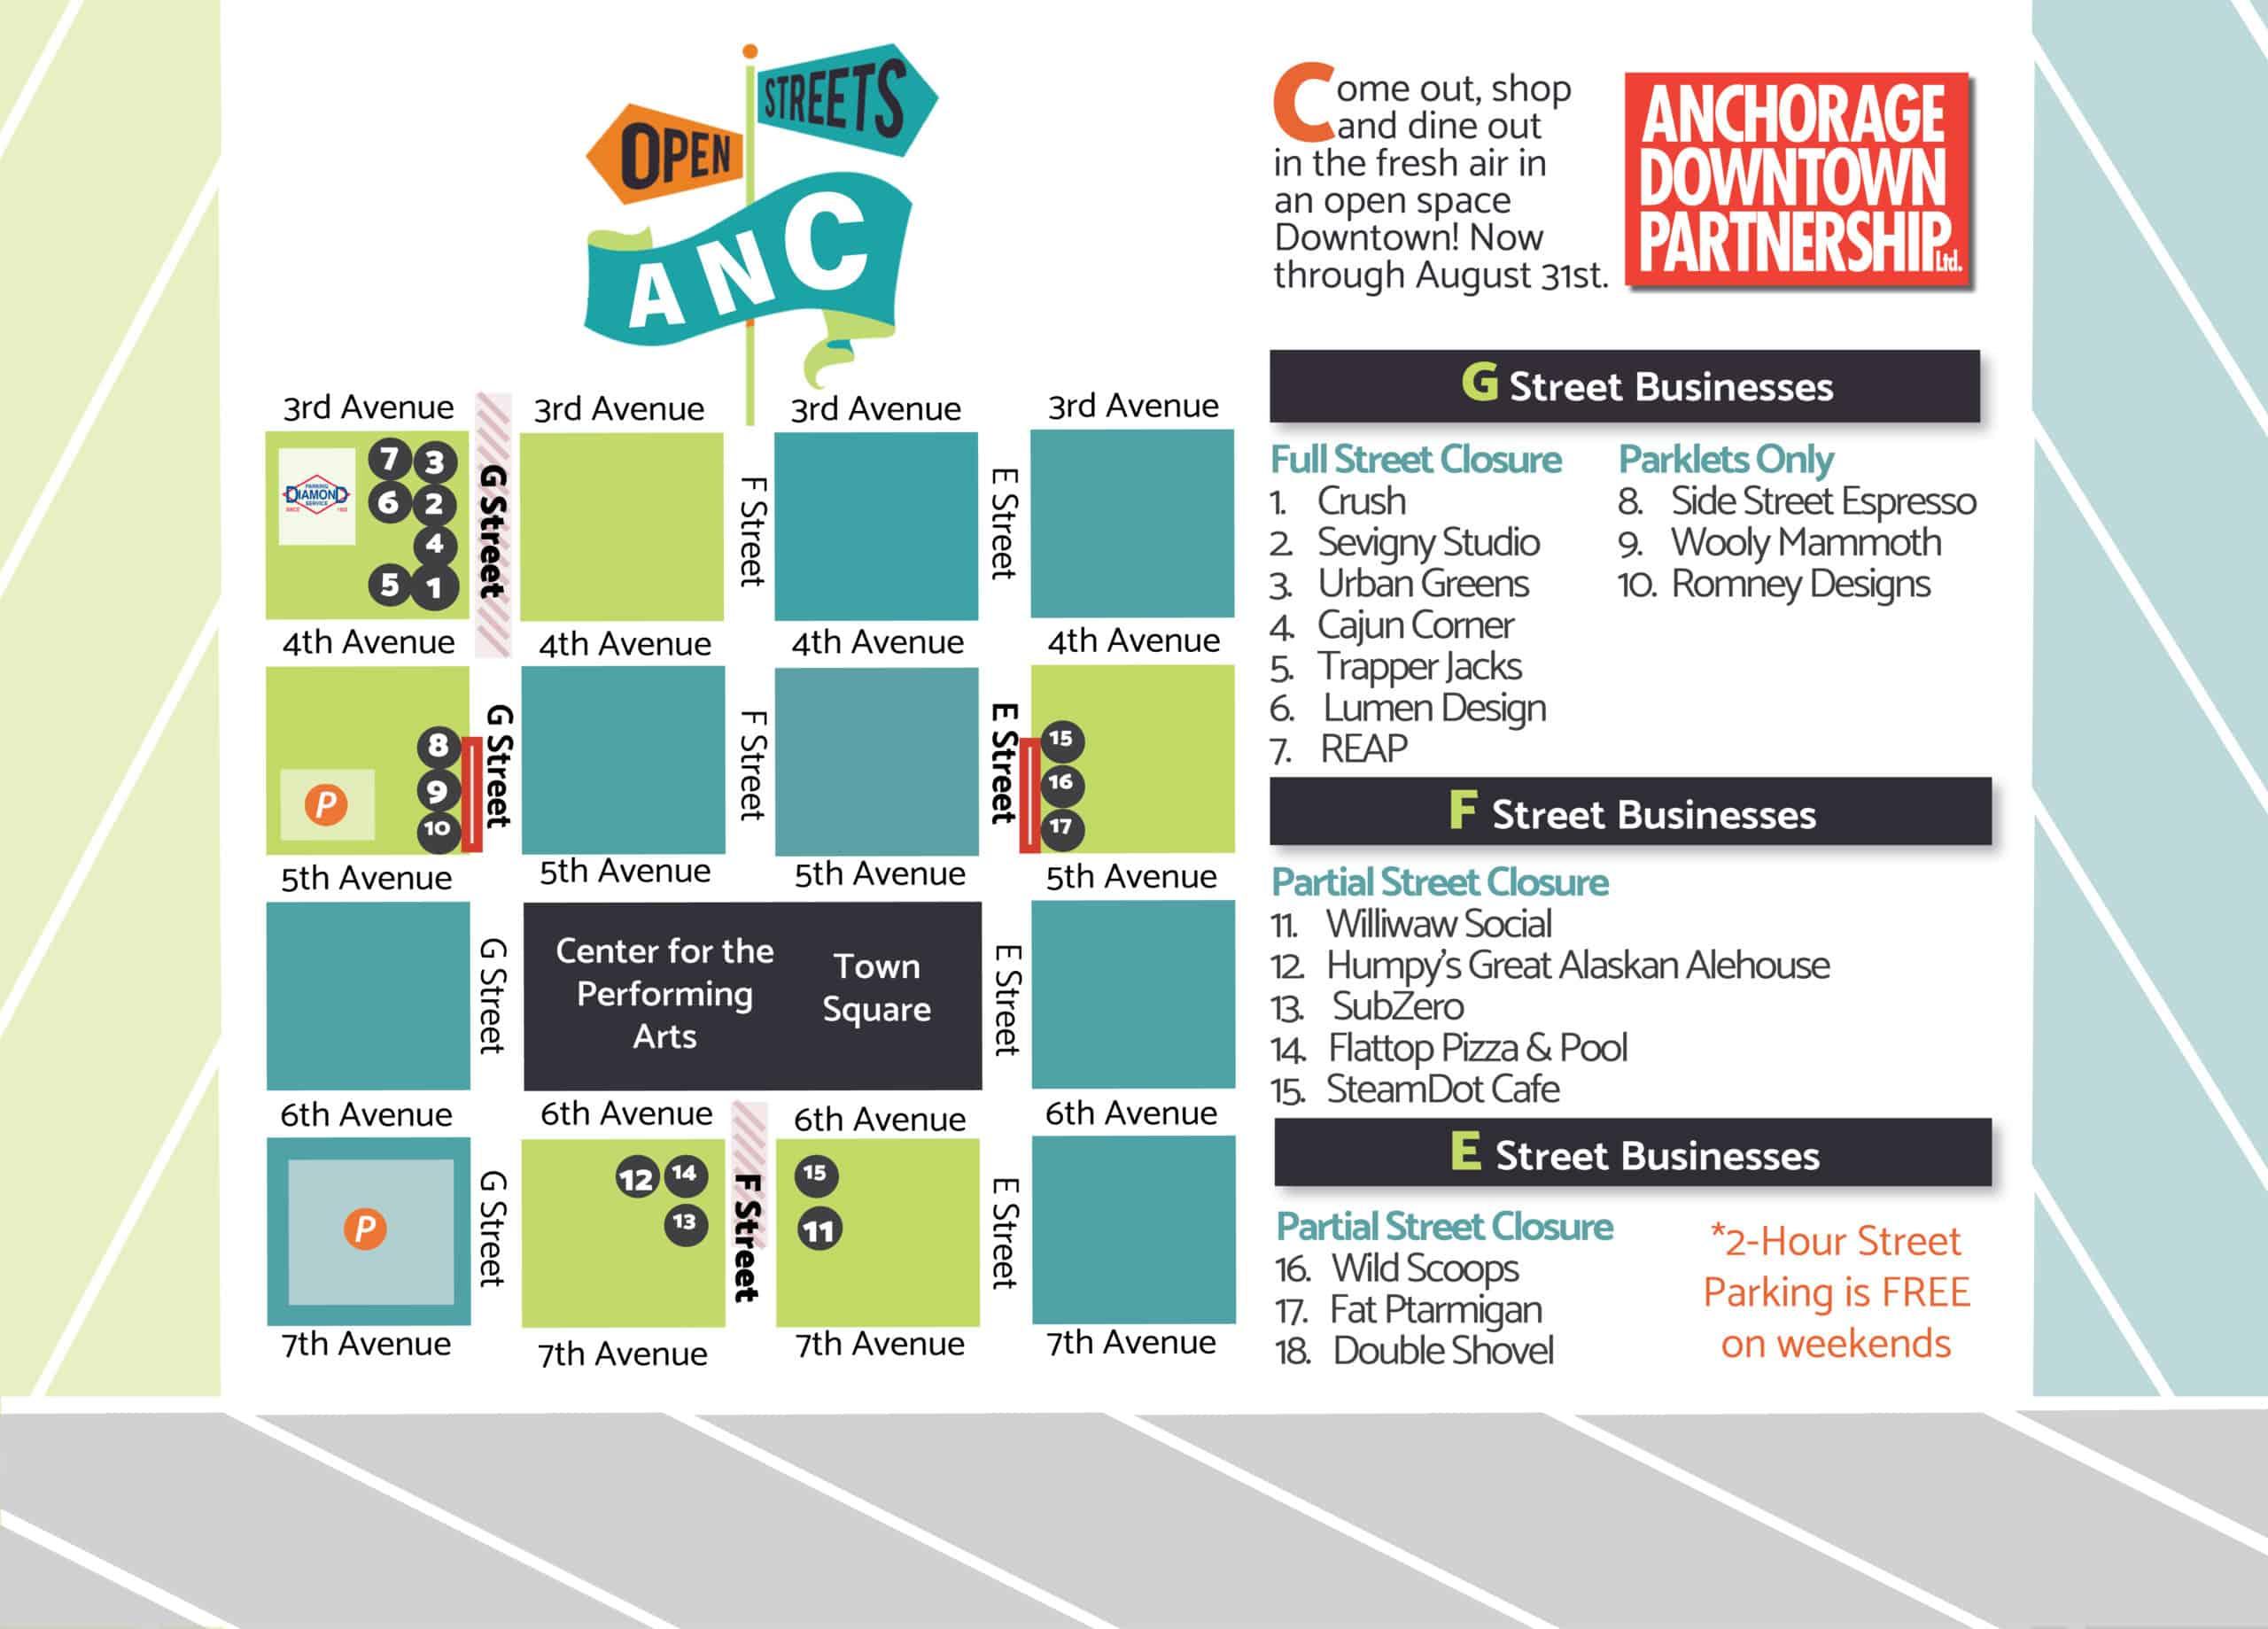 Anchorage Visitor Information Center